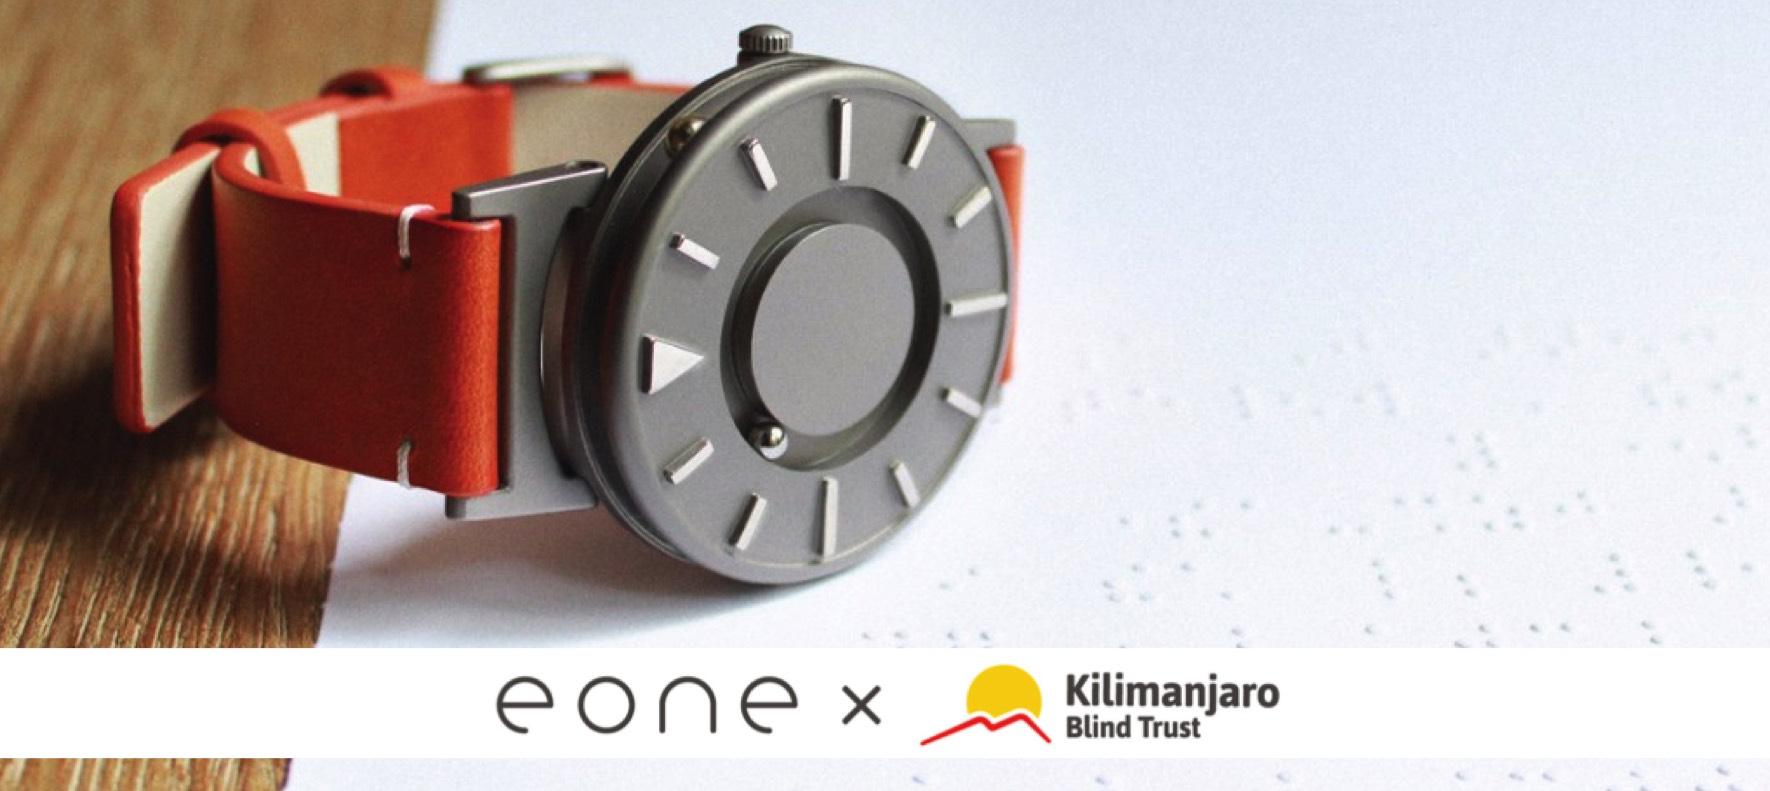 Header image of Eone's Bradley x KBT collaboration model